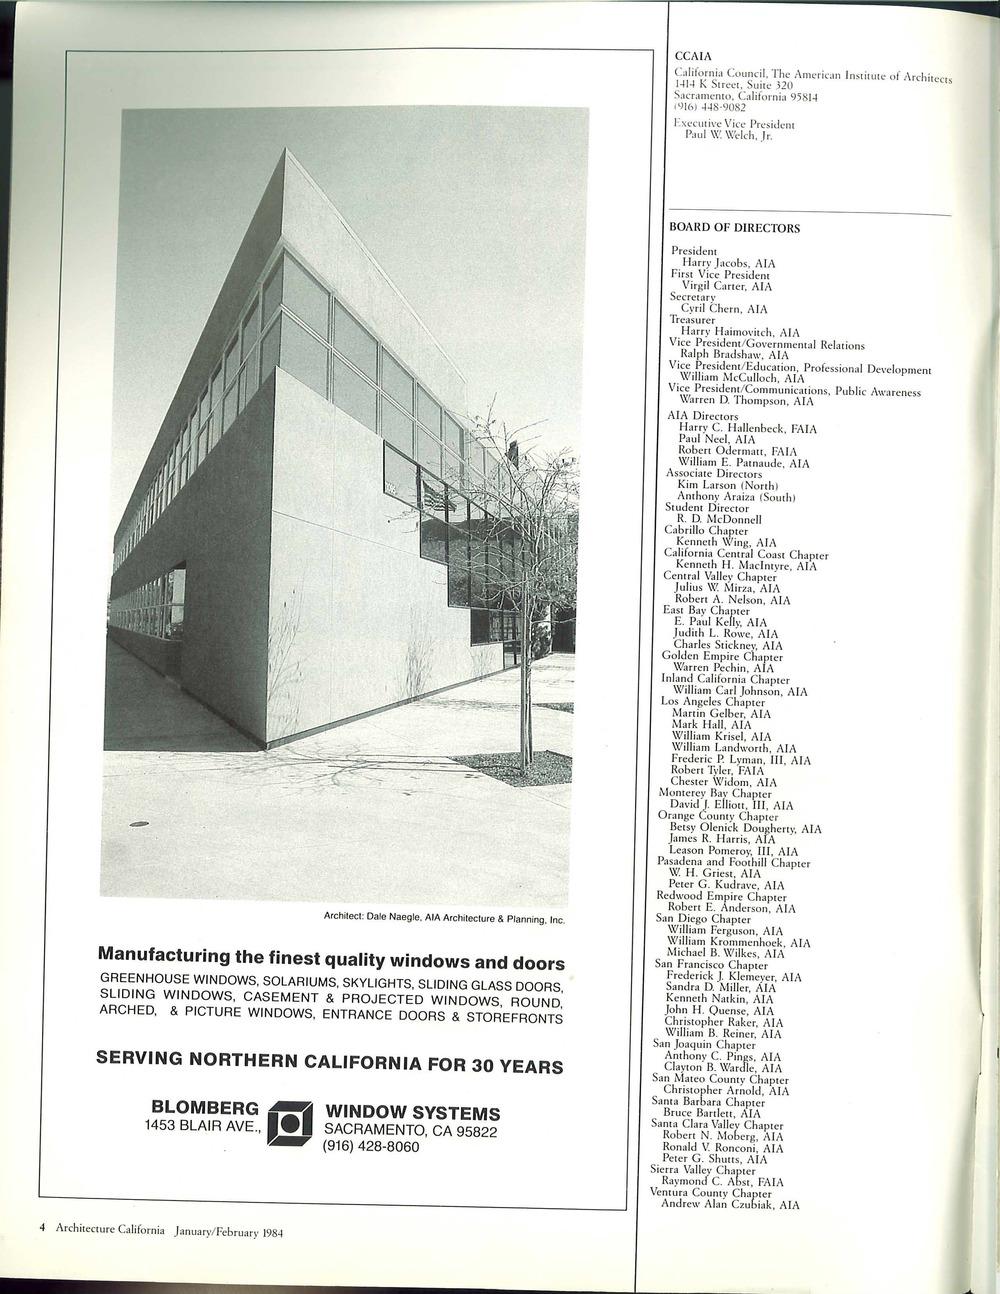 architecture california_1984_Page_2.jpg